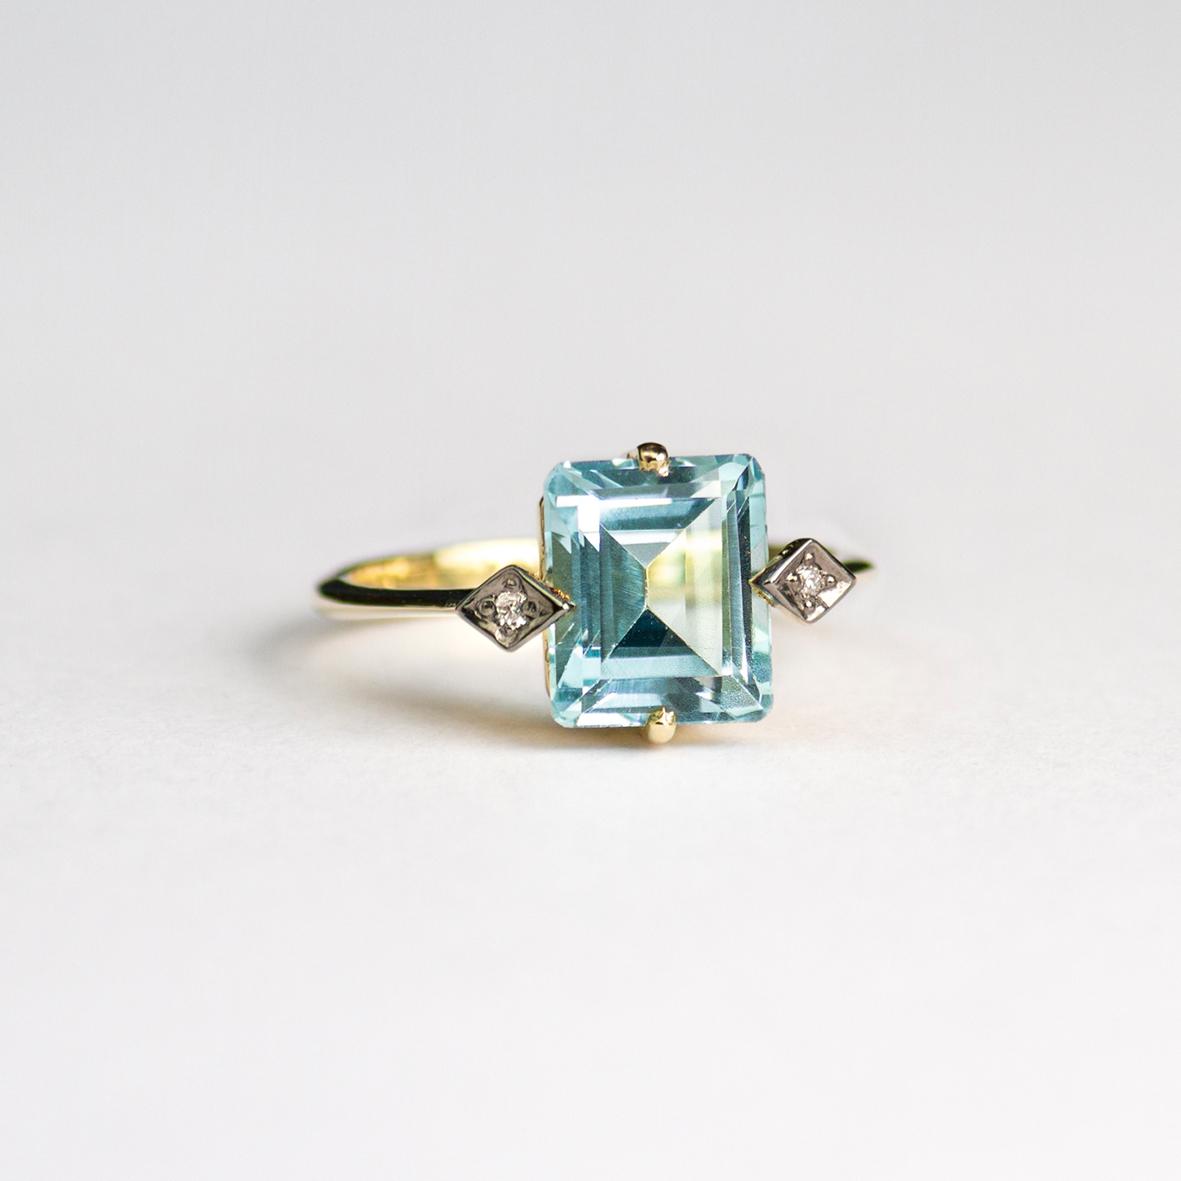 3. OONA_gems of ceylon_ficha1_blue aquamarine ring